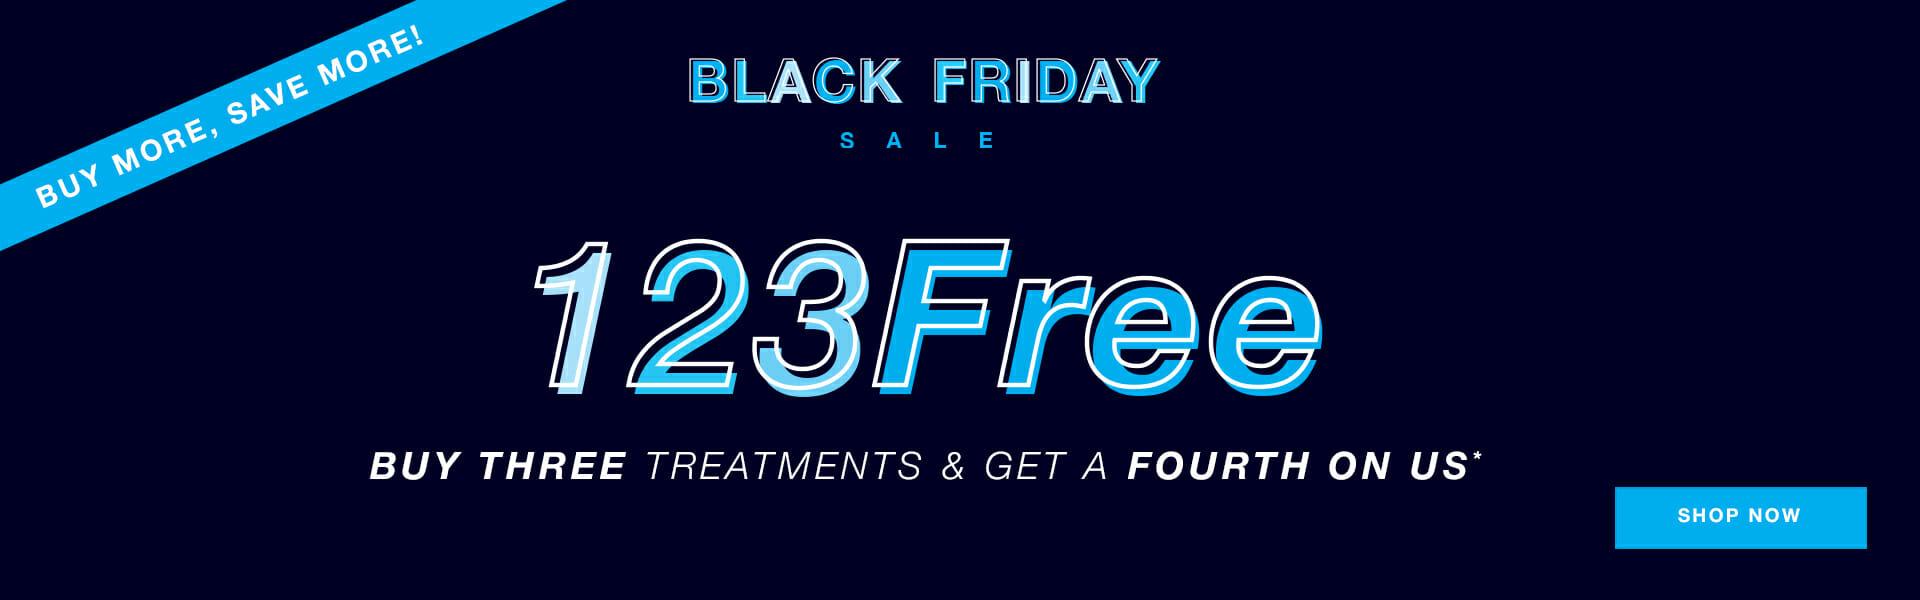 ClinicSite_Laser_BlackFriday–123Free